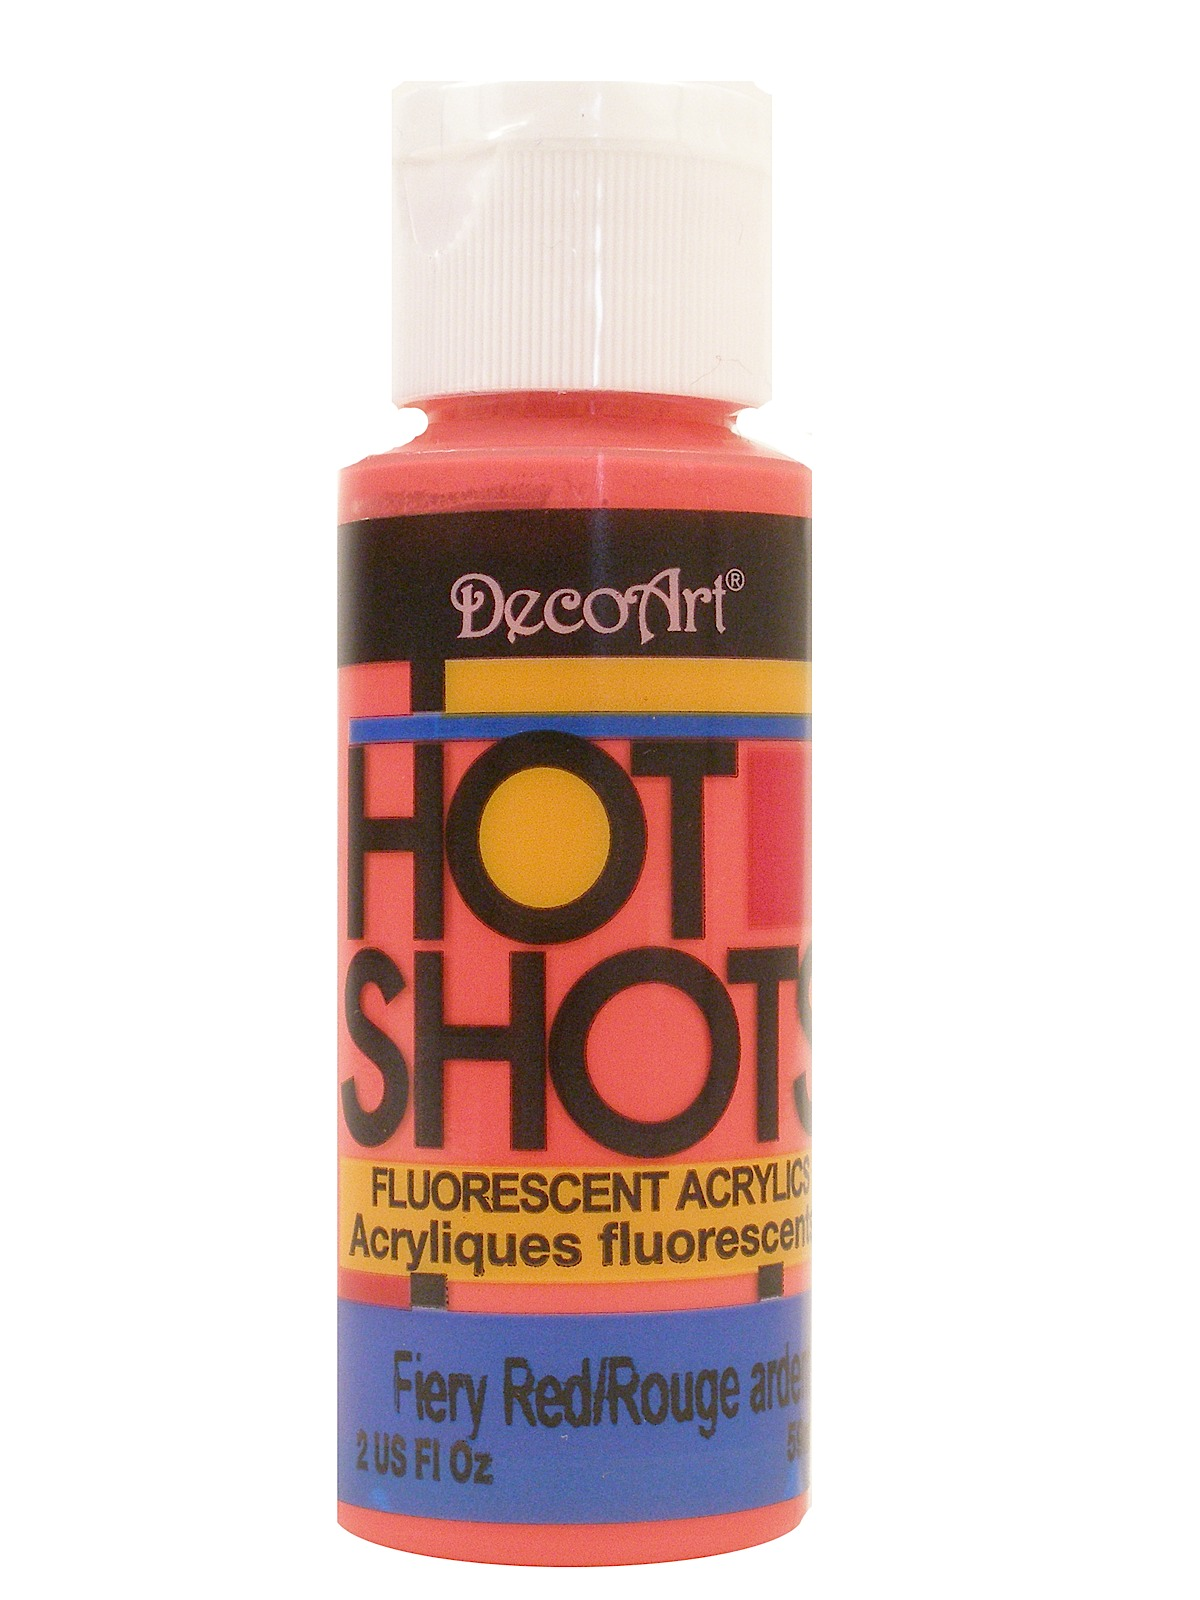 Hot Shots Fluorescent Acrylics